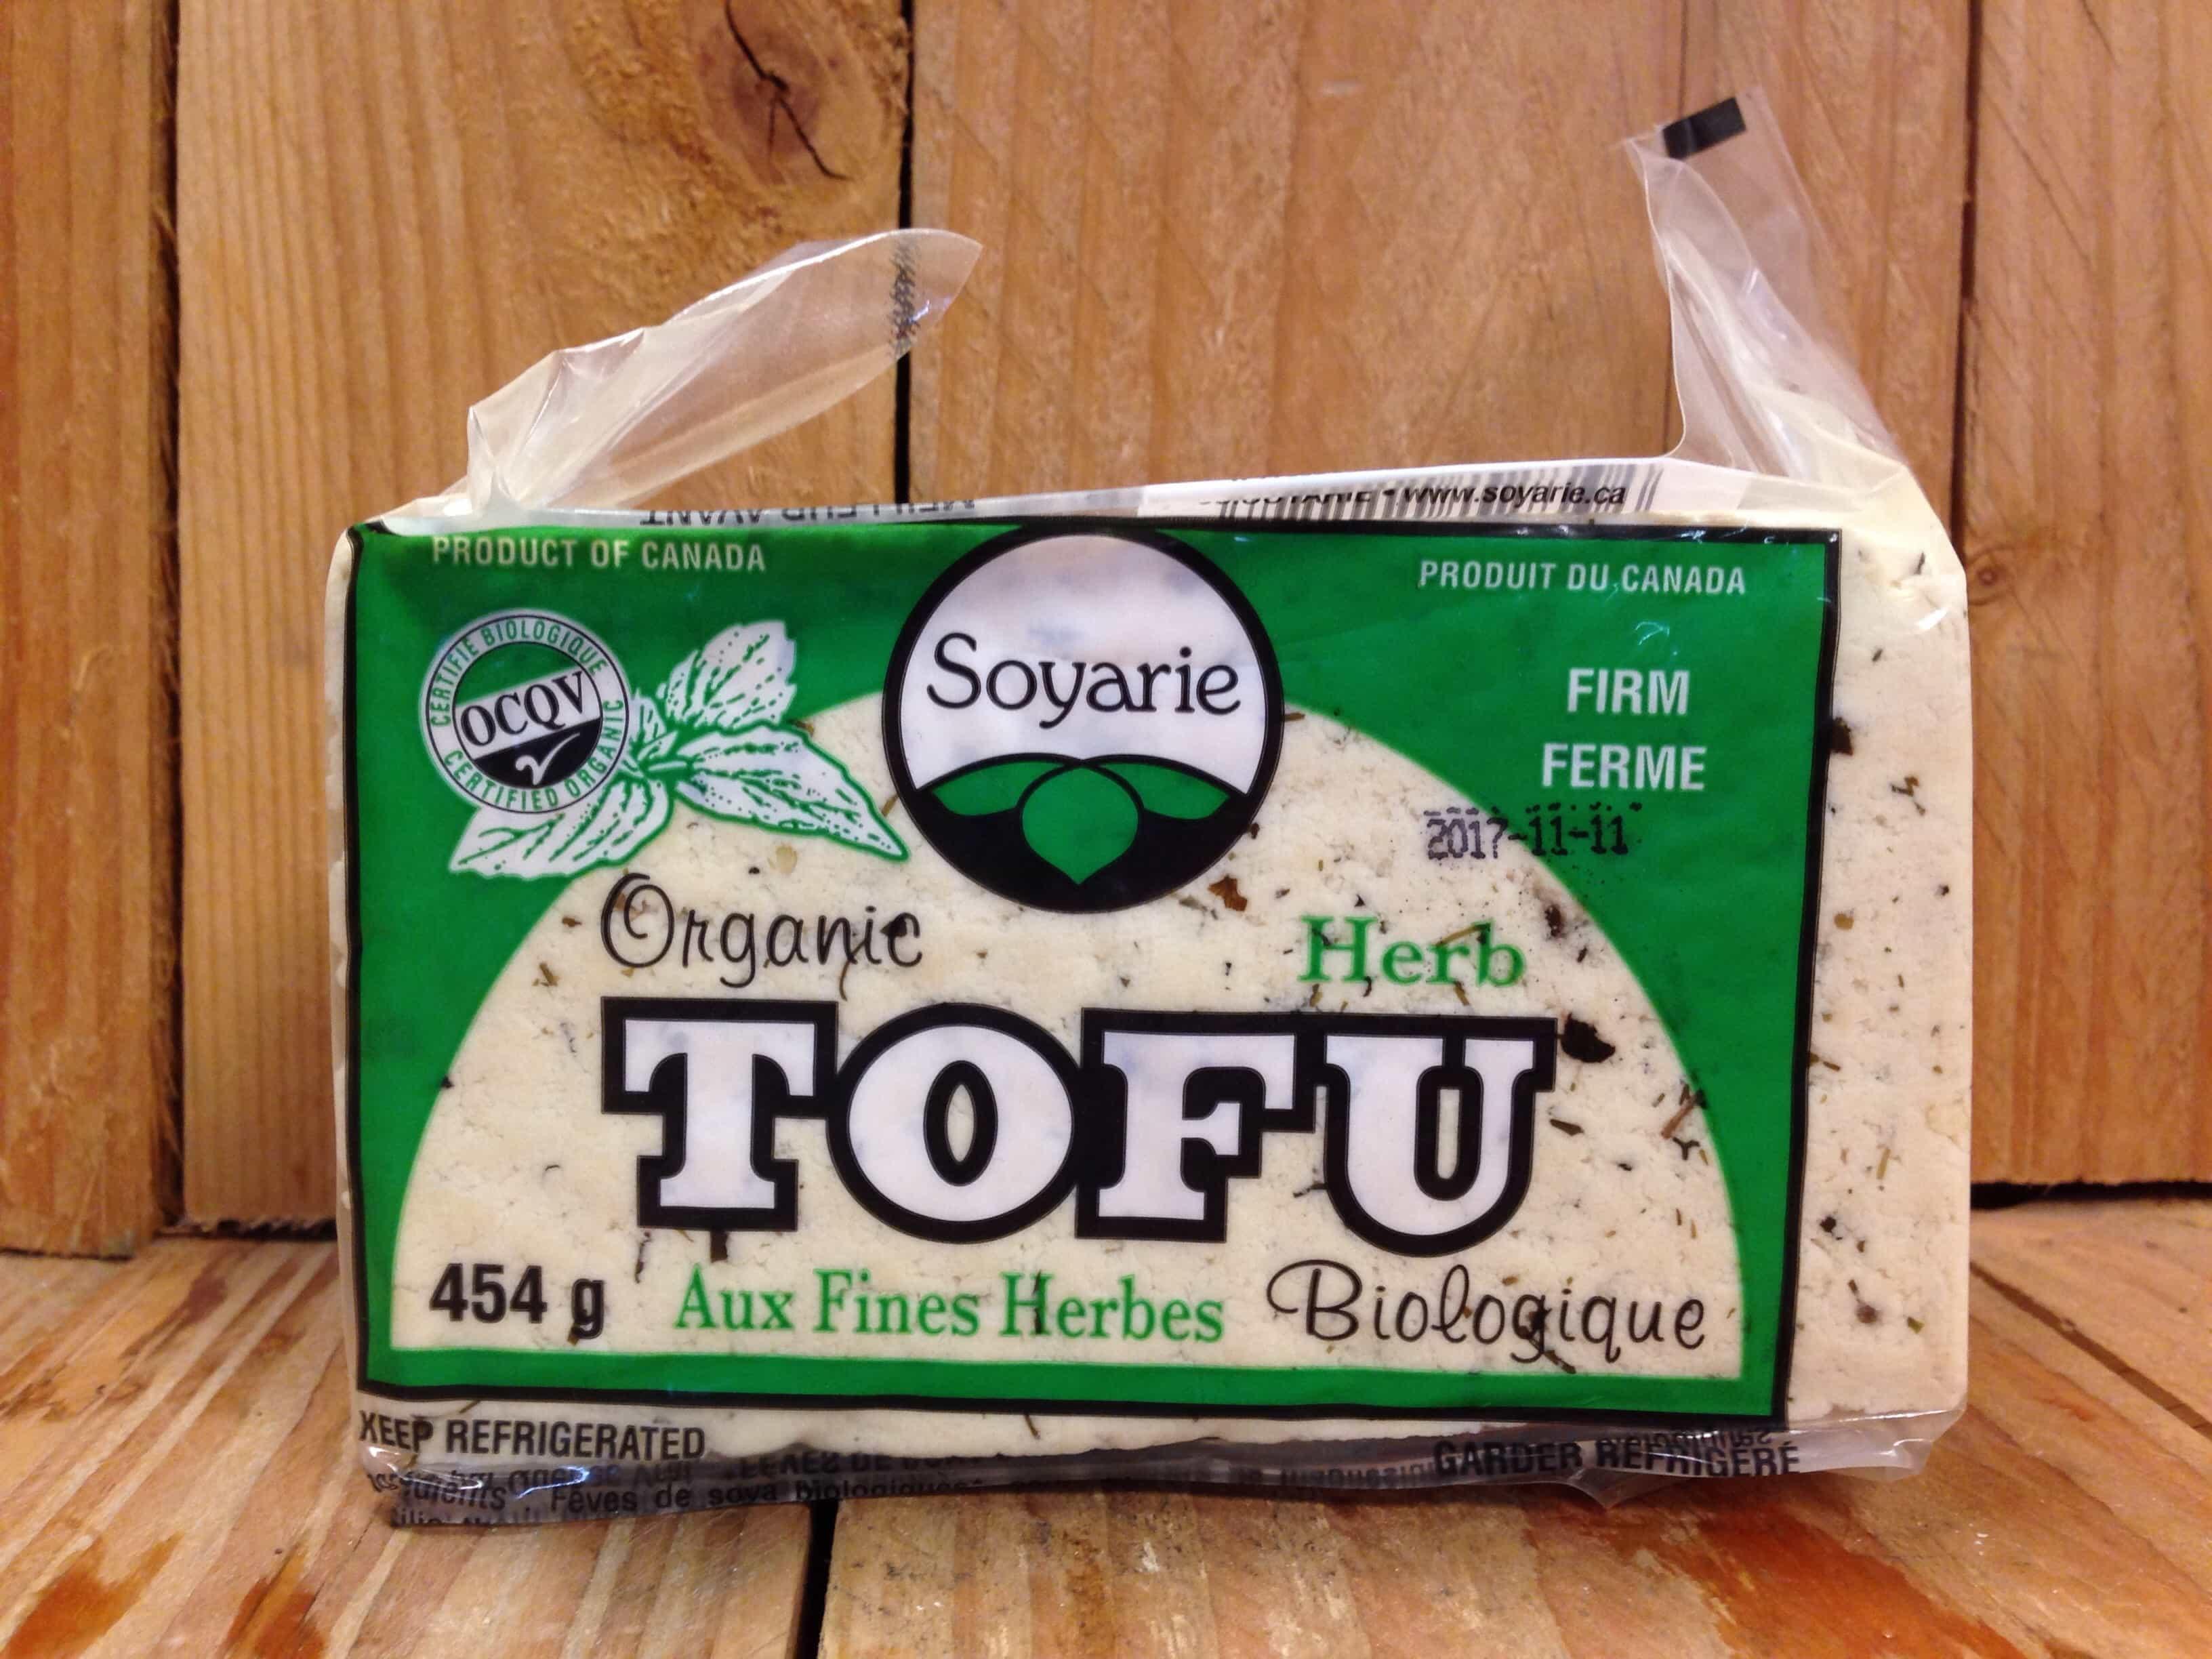 La Soyarie – Tofu – Organic Firm with Herbs LOCAL (454g)